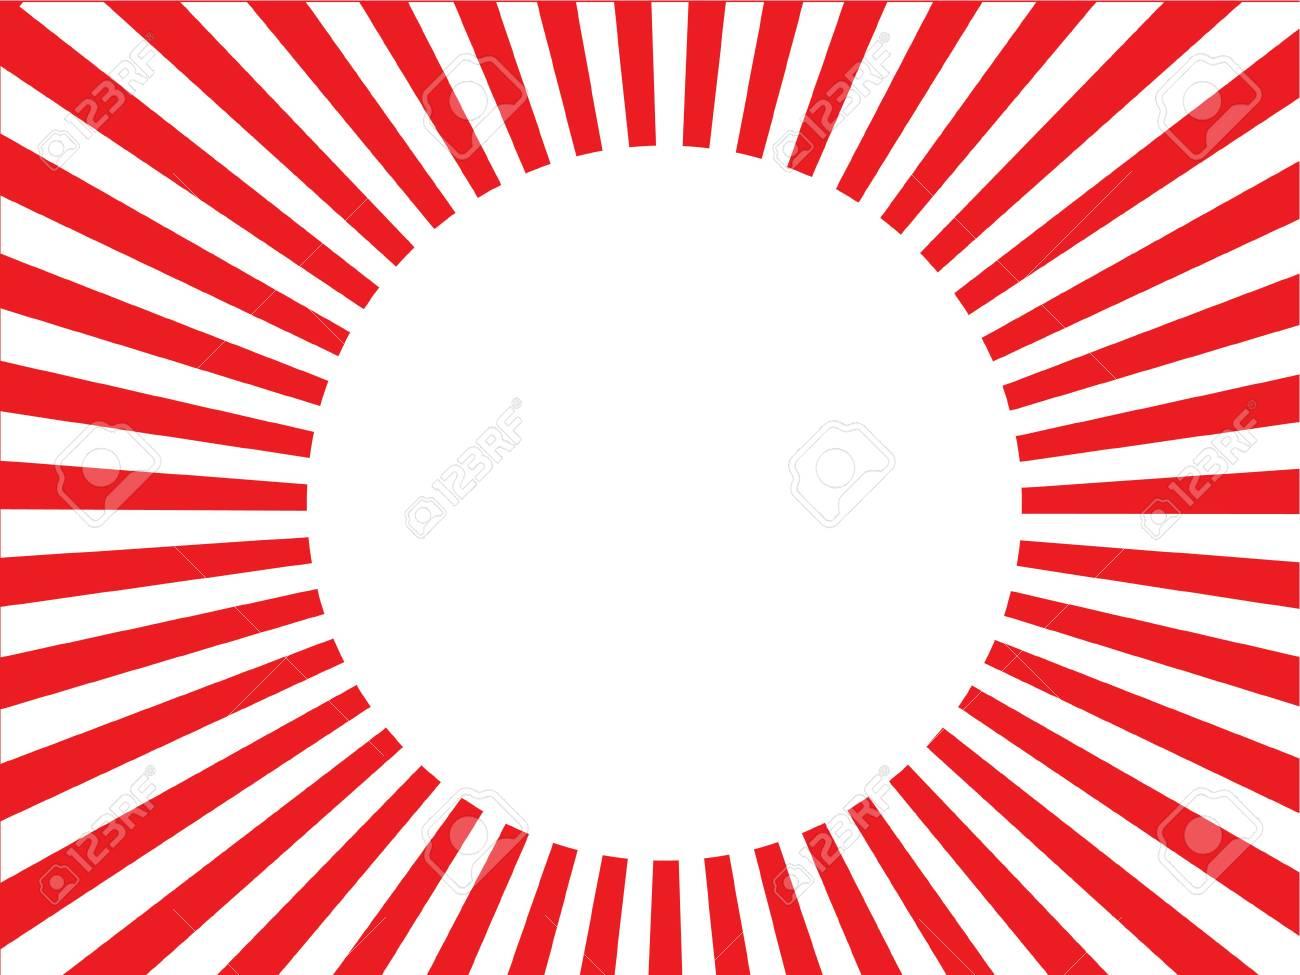 sun sunburst pattern sunburst background sunburst vector sunburst rh 123rf com free sunburst vector graphic vector sunburst vintage